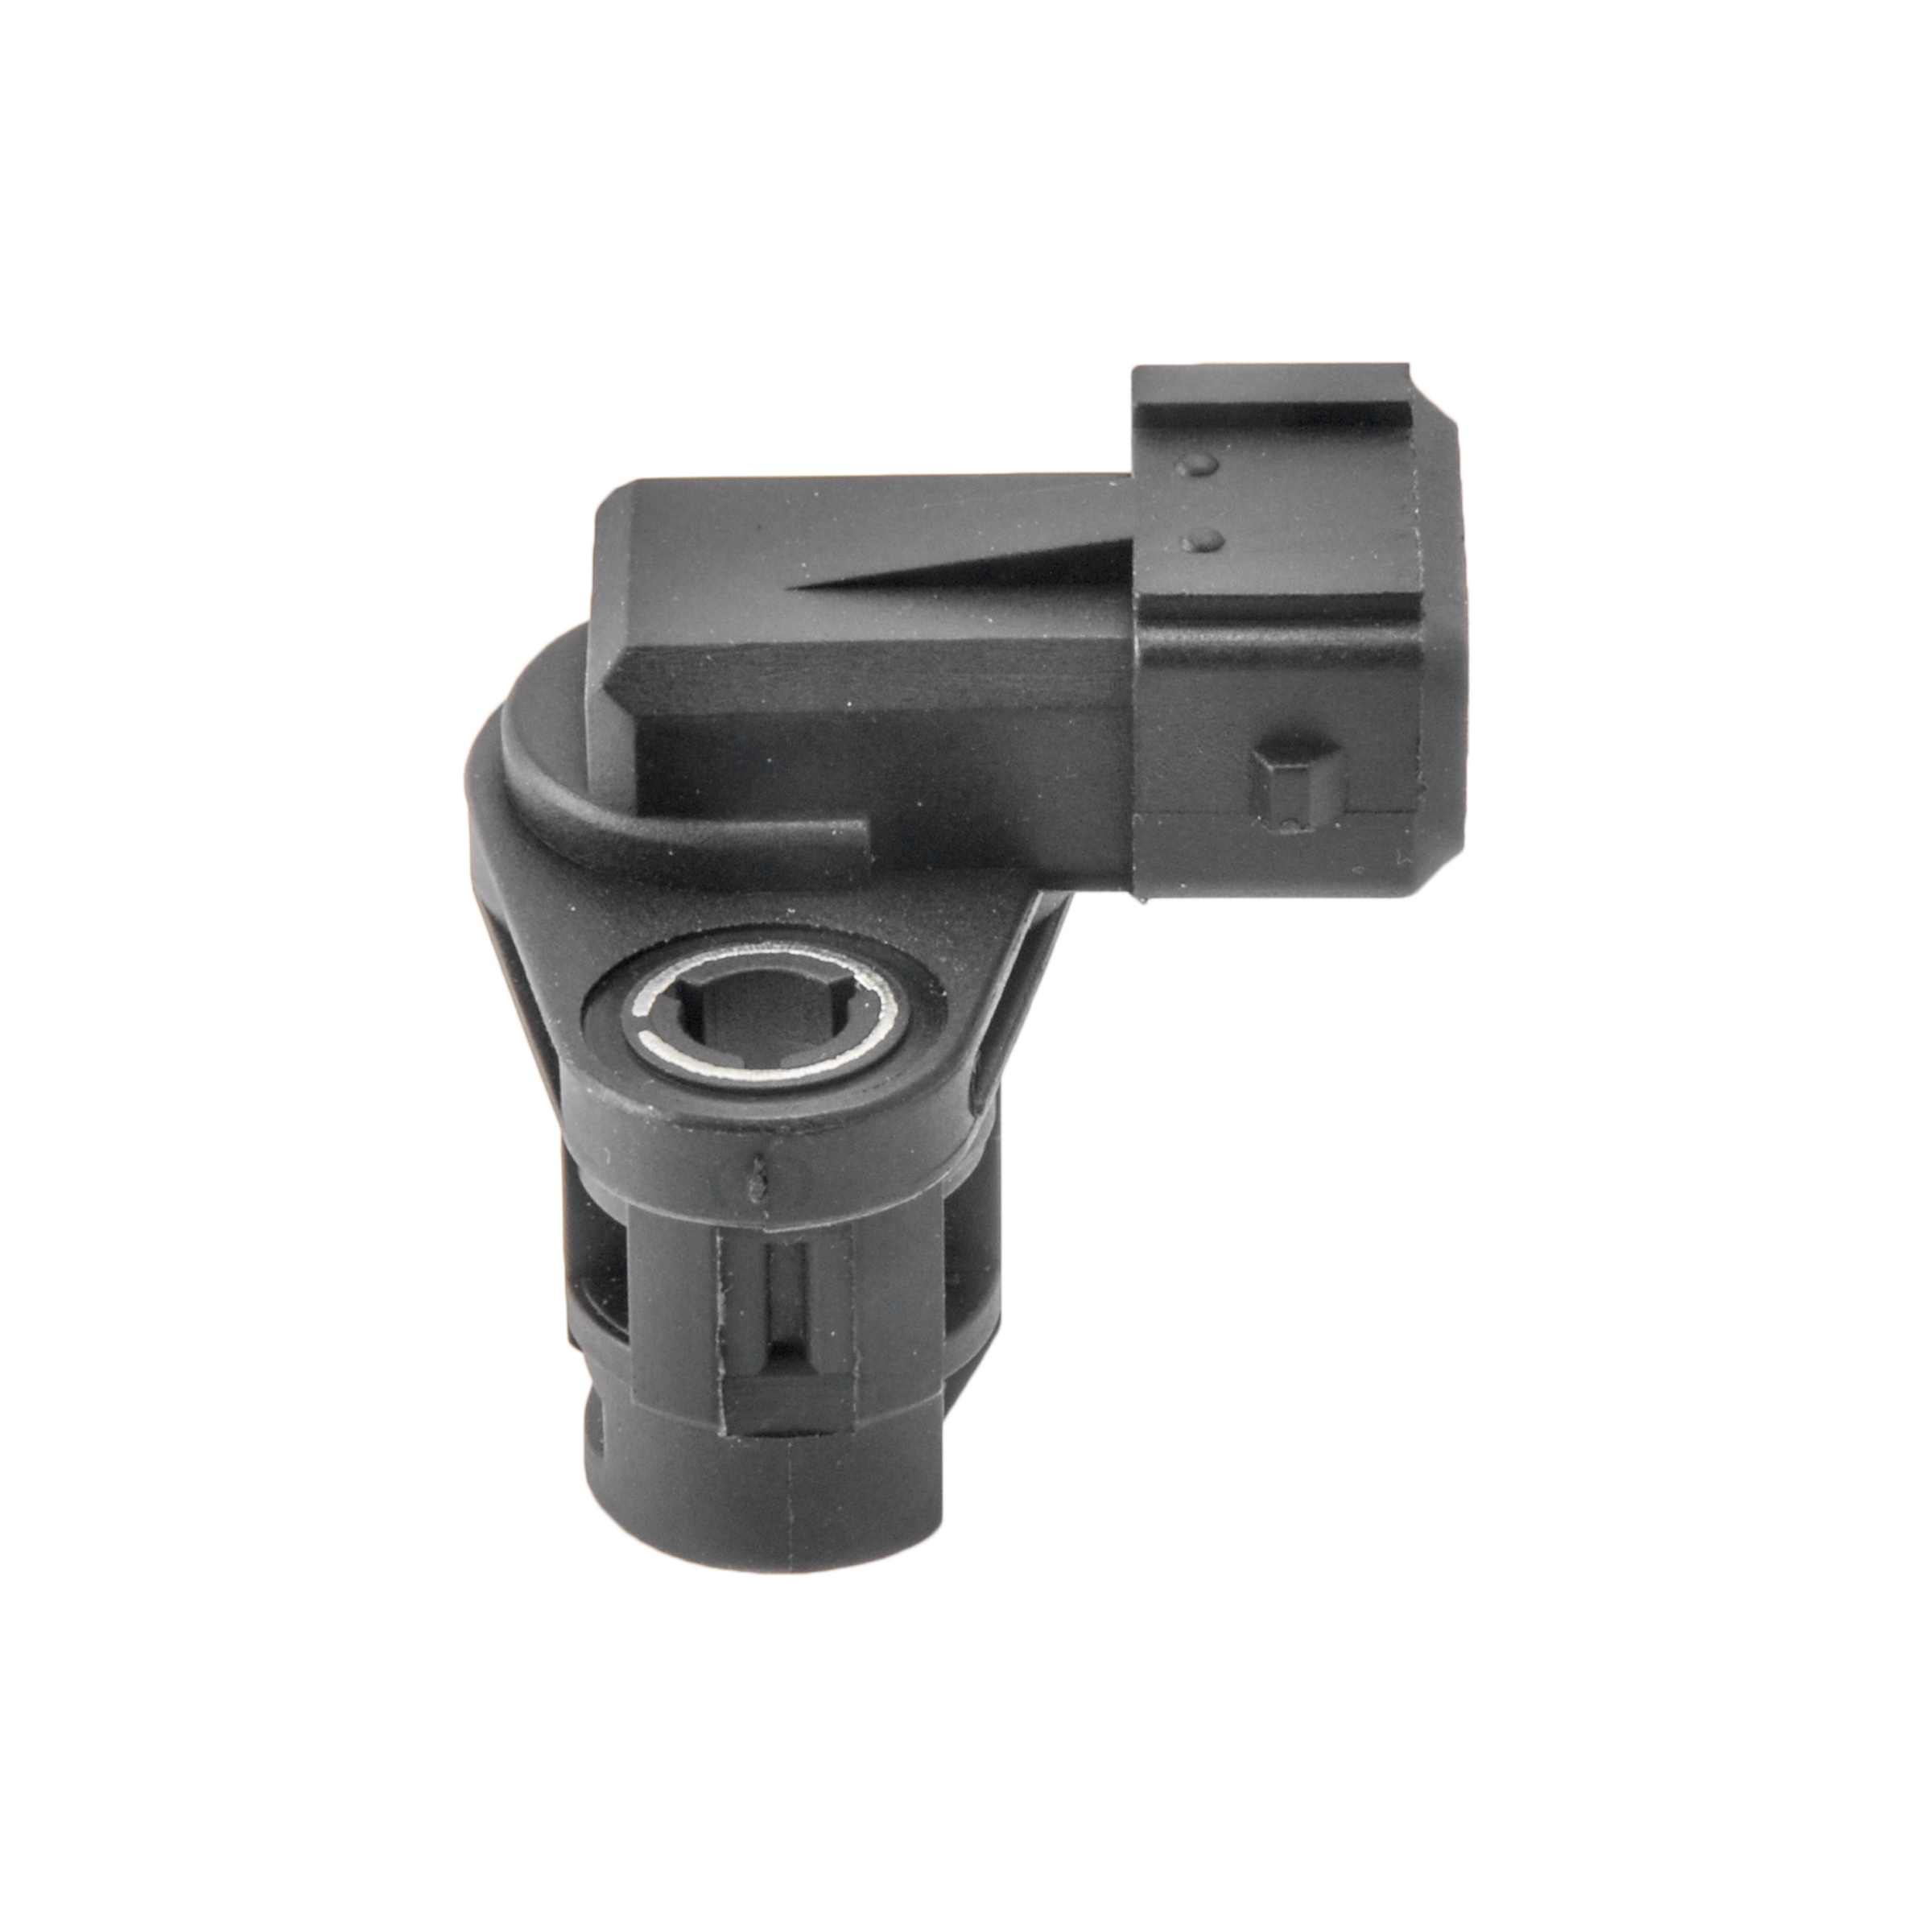 2013 Hyundai Azera Camshaft: New Herko Camshaft Position Sensor PCH661 For Hyundai